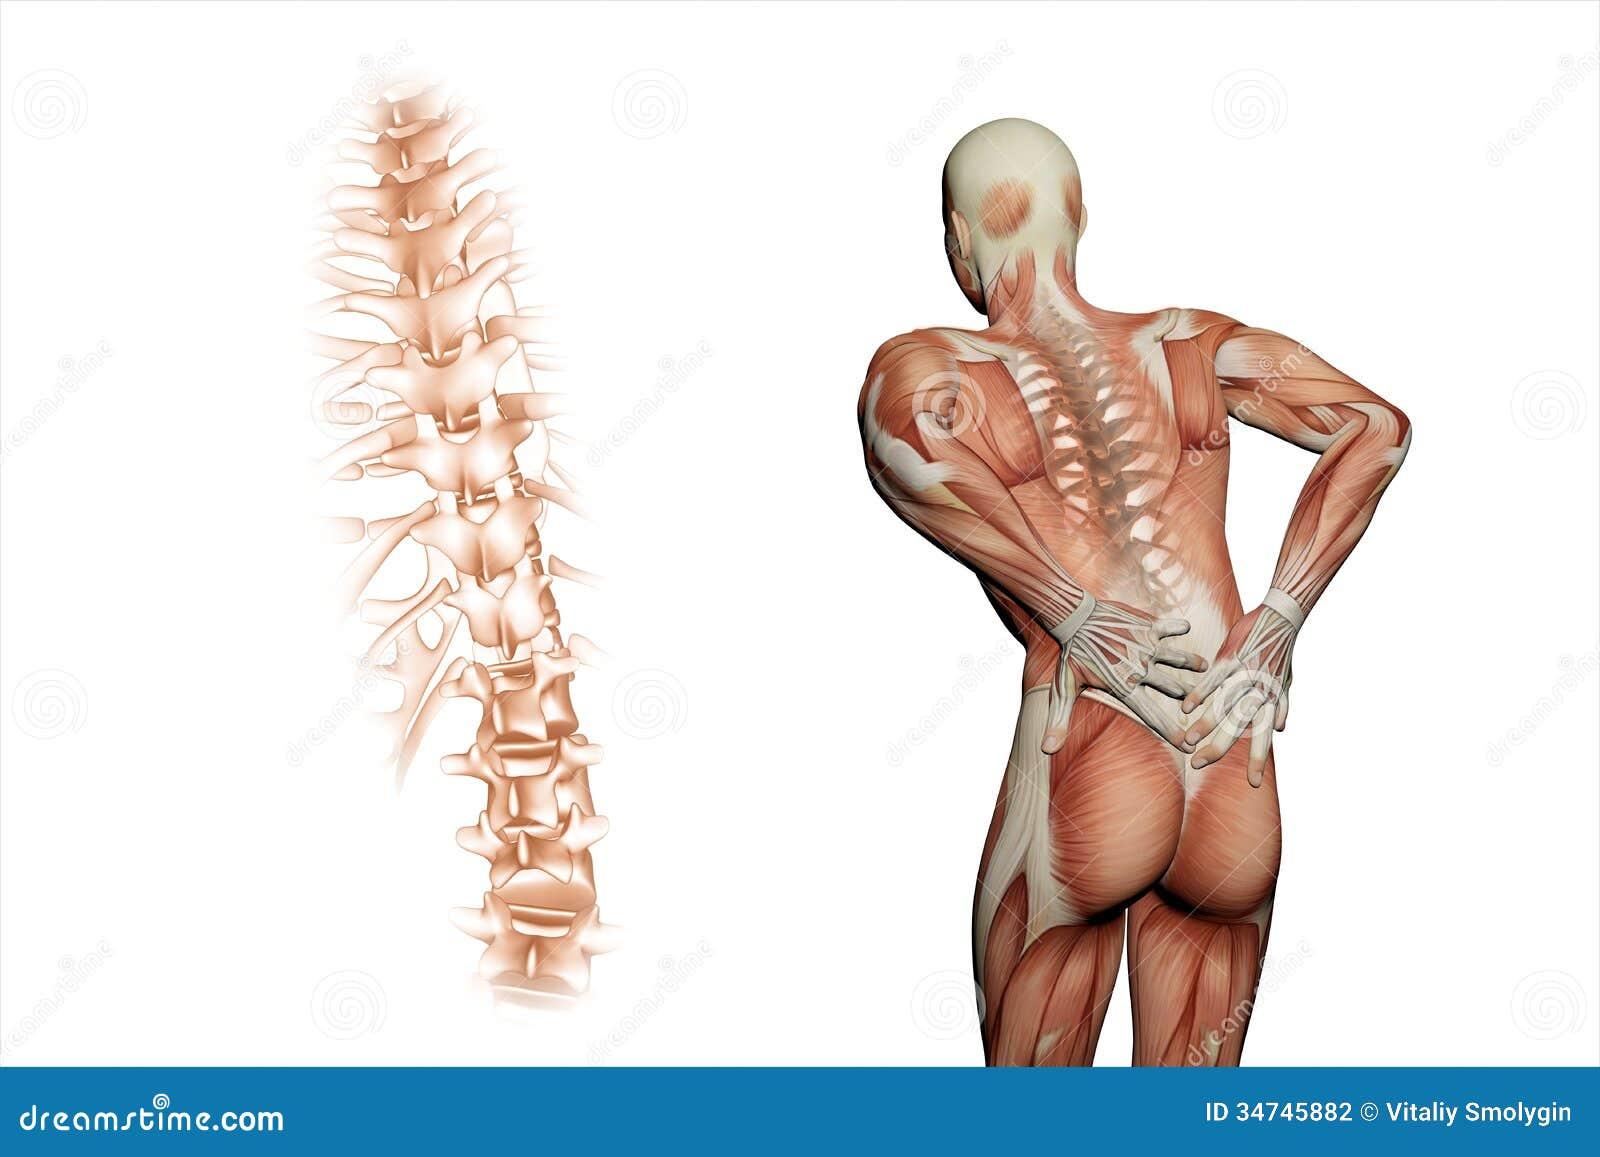 Anatomical Vision Back Pain Stock Illustration - Illustration of ...